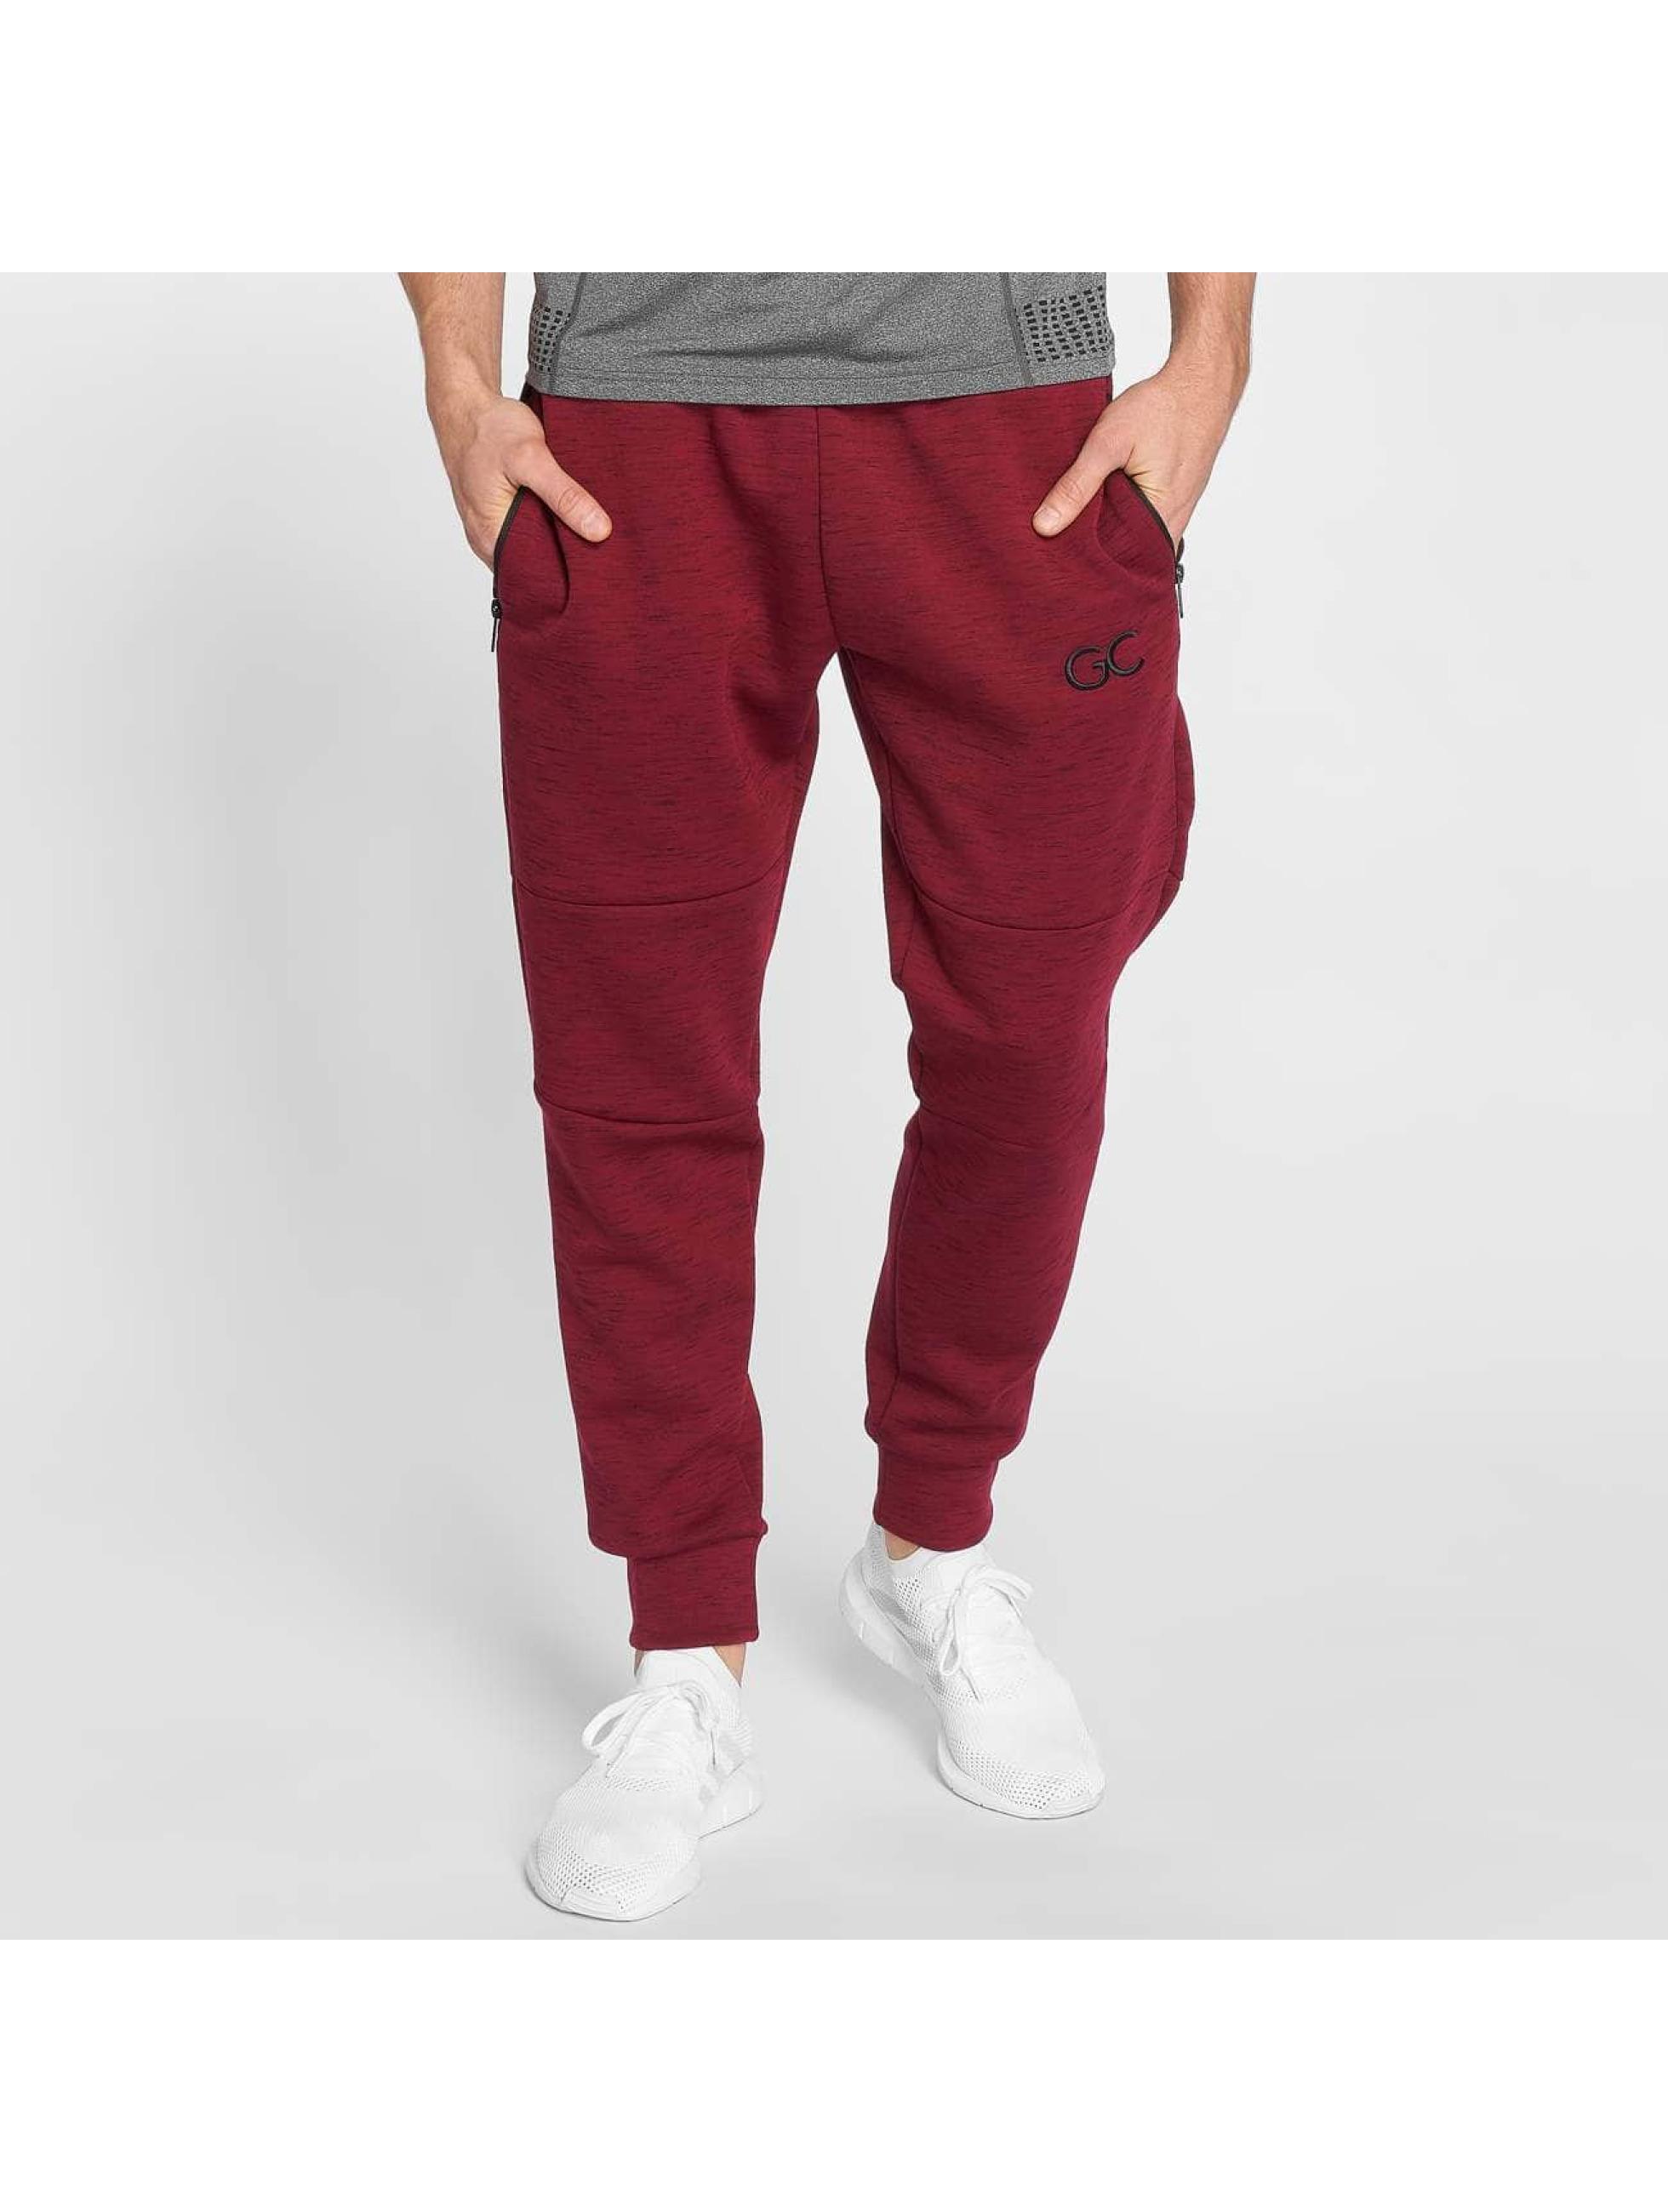 GymCodes Pantalón deportivo Athletic-Fit rojo